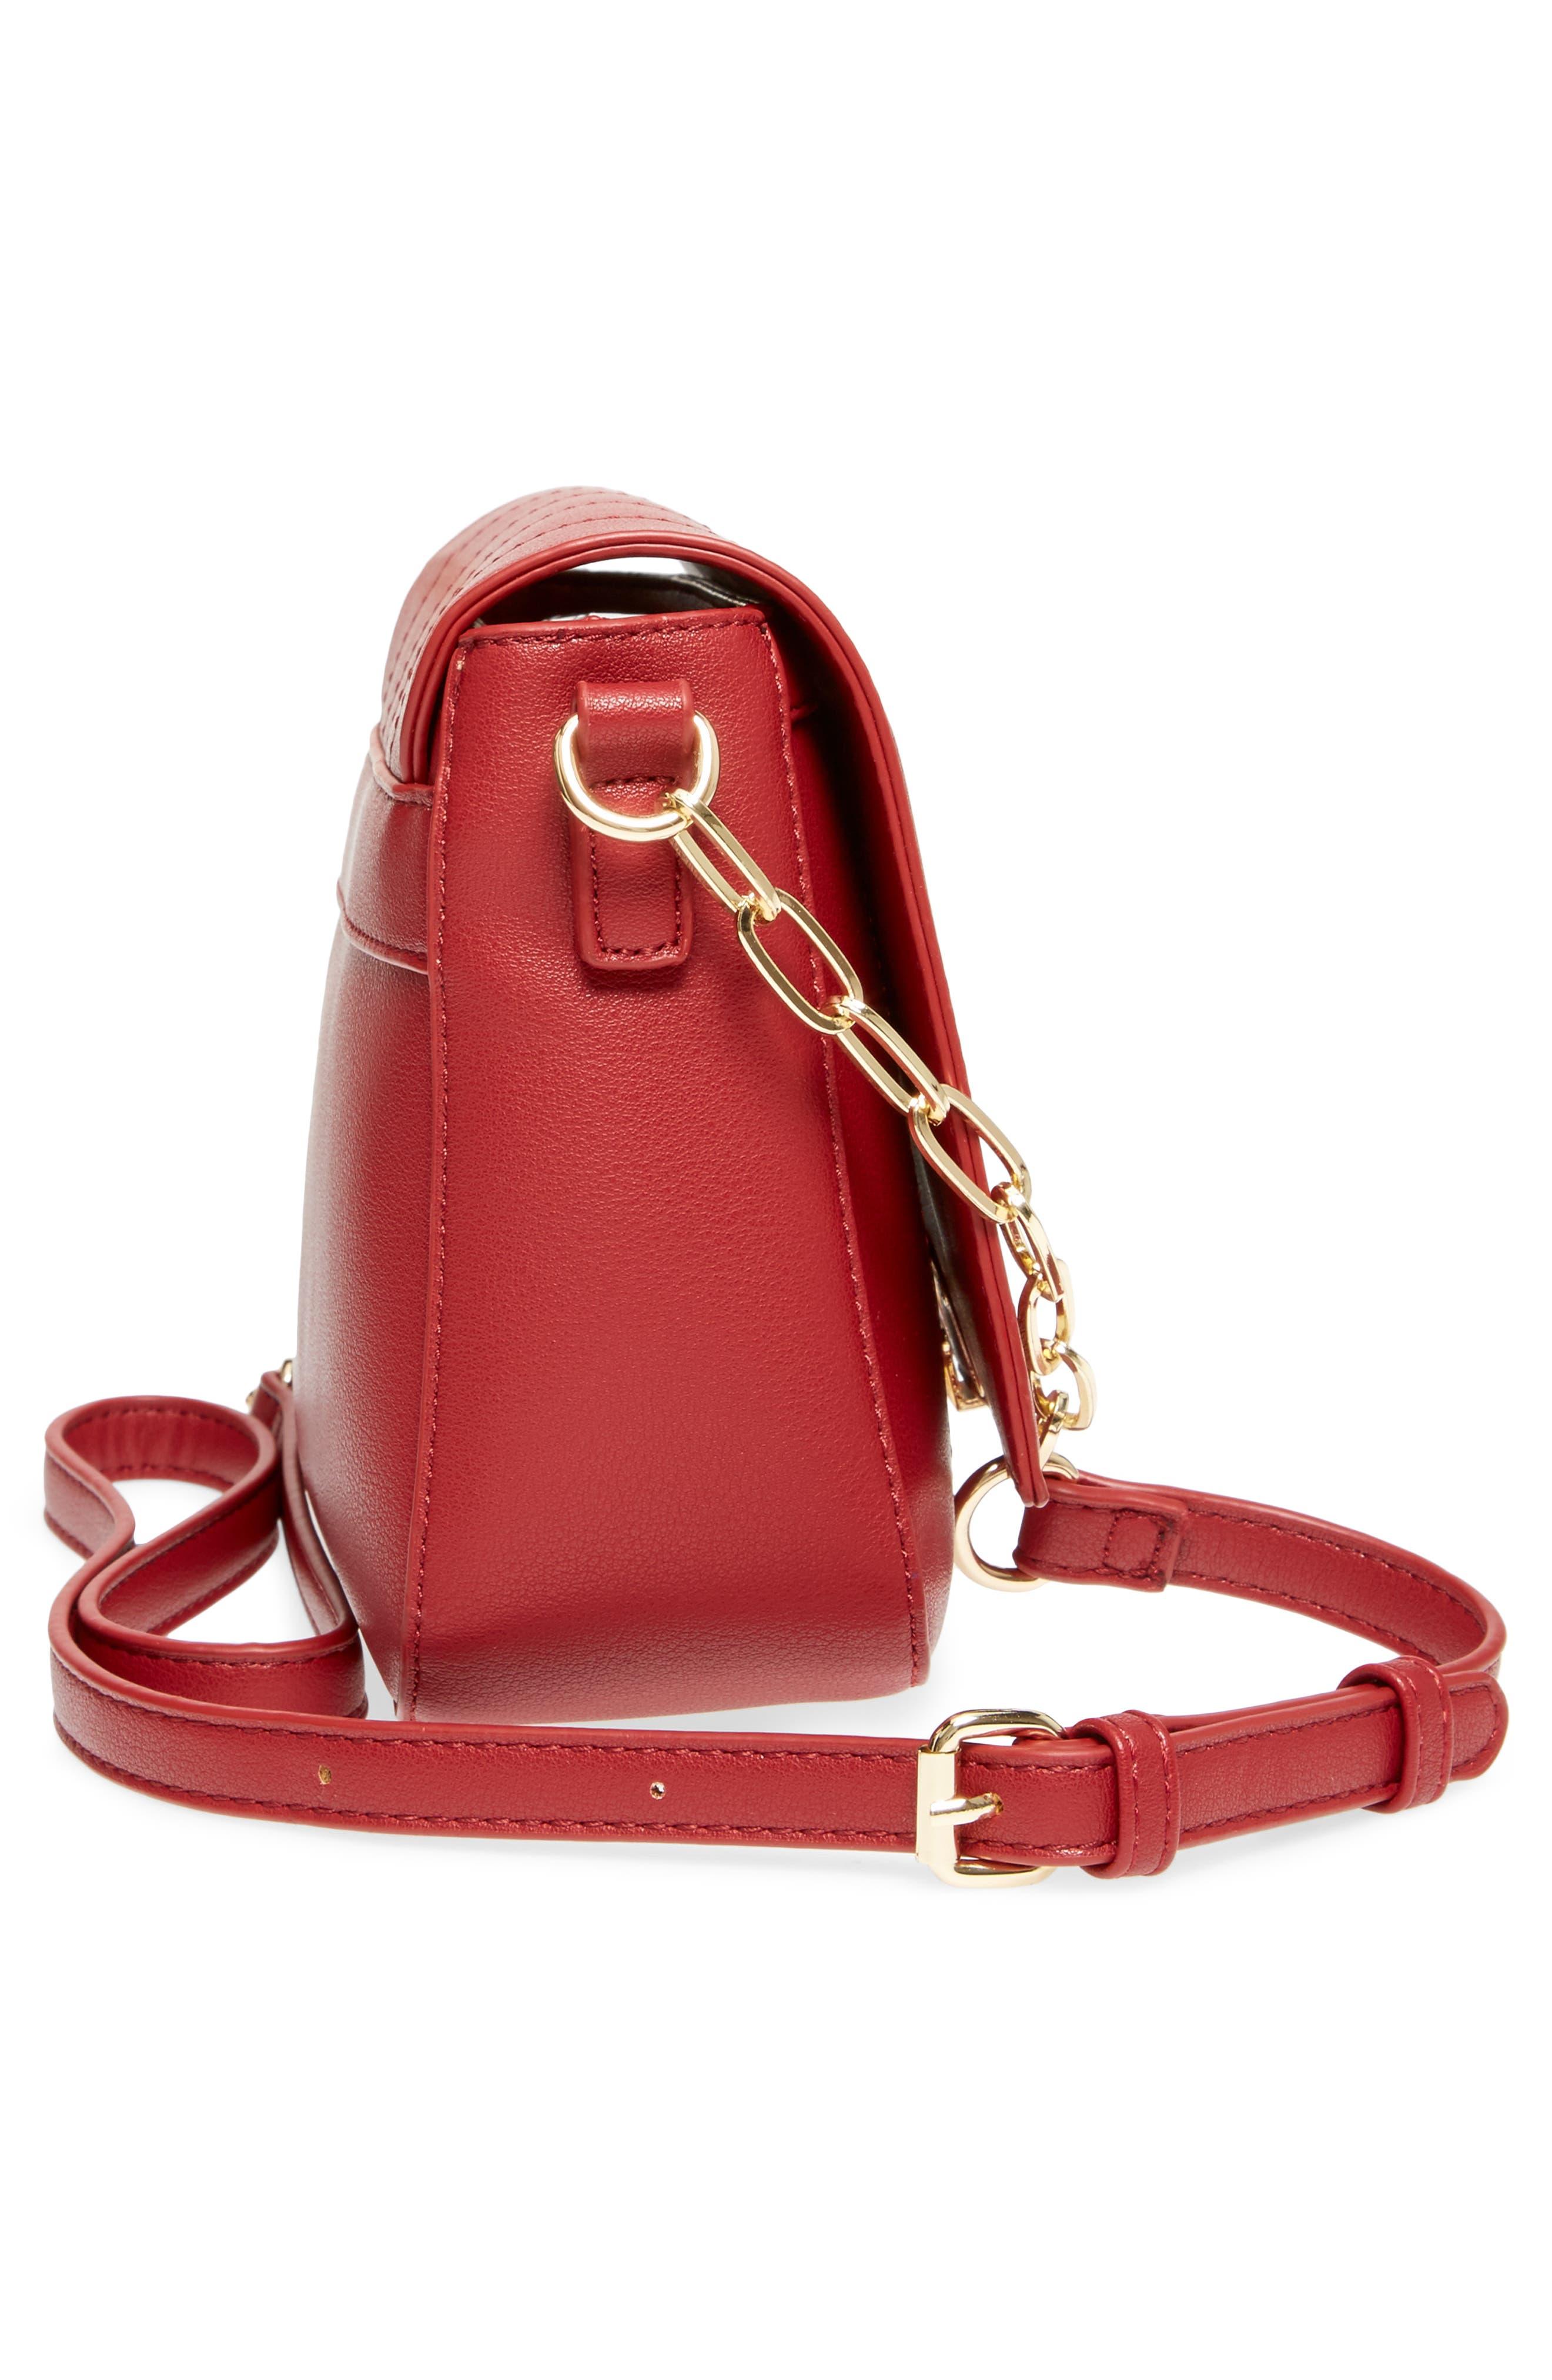 Colie Faux Leather Crossbody Bag,                             Alternate thumbnail 15, color,